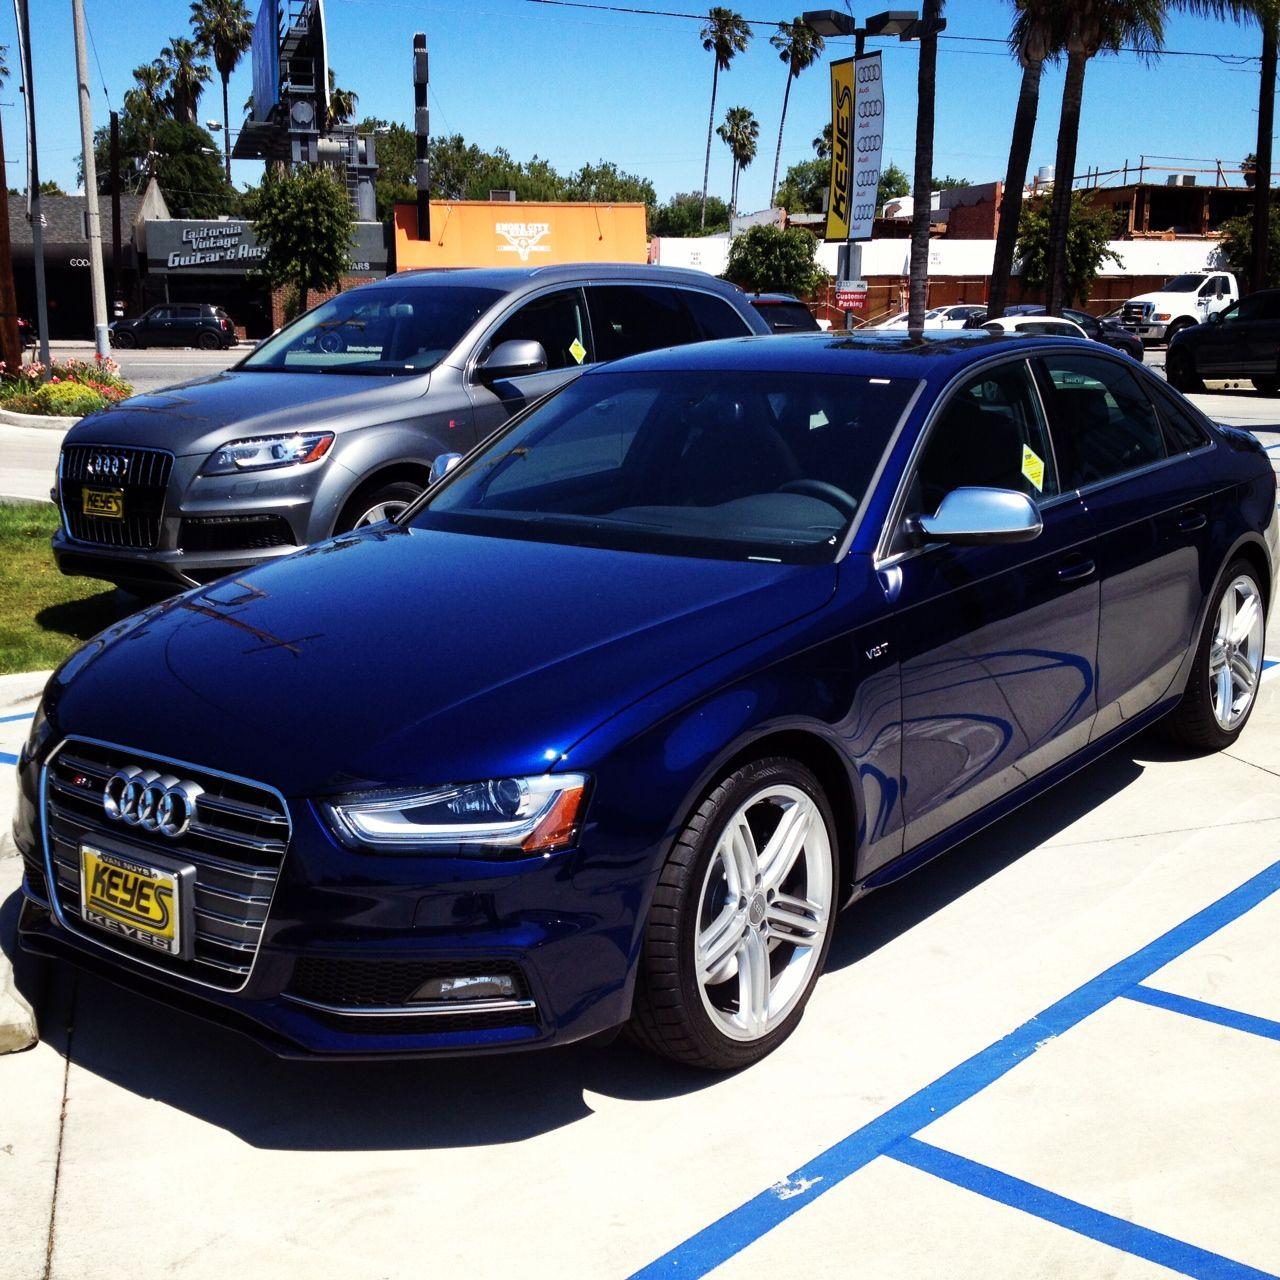 2013 Audi S4 Prestige In Estoril Blue Crystal Effect. What